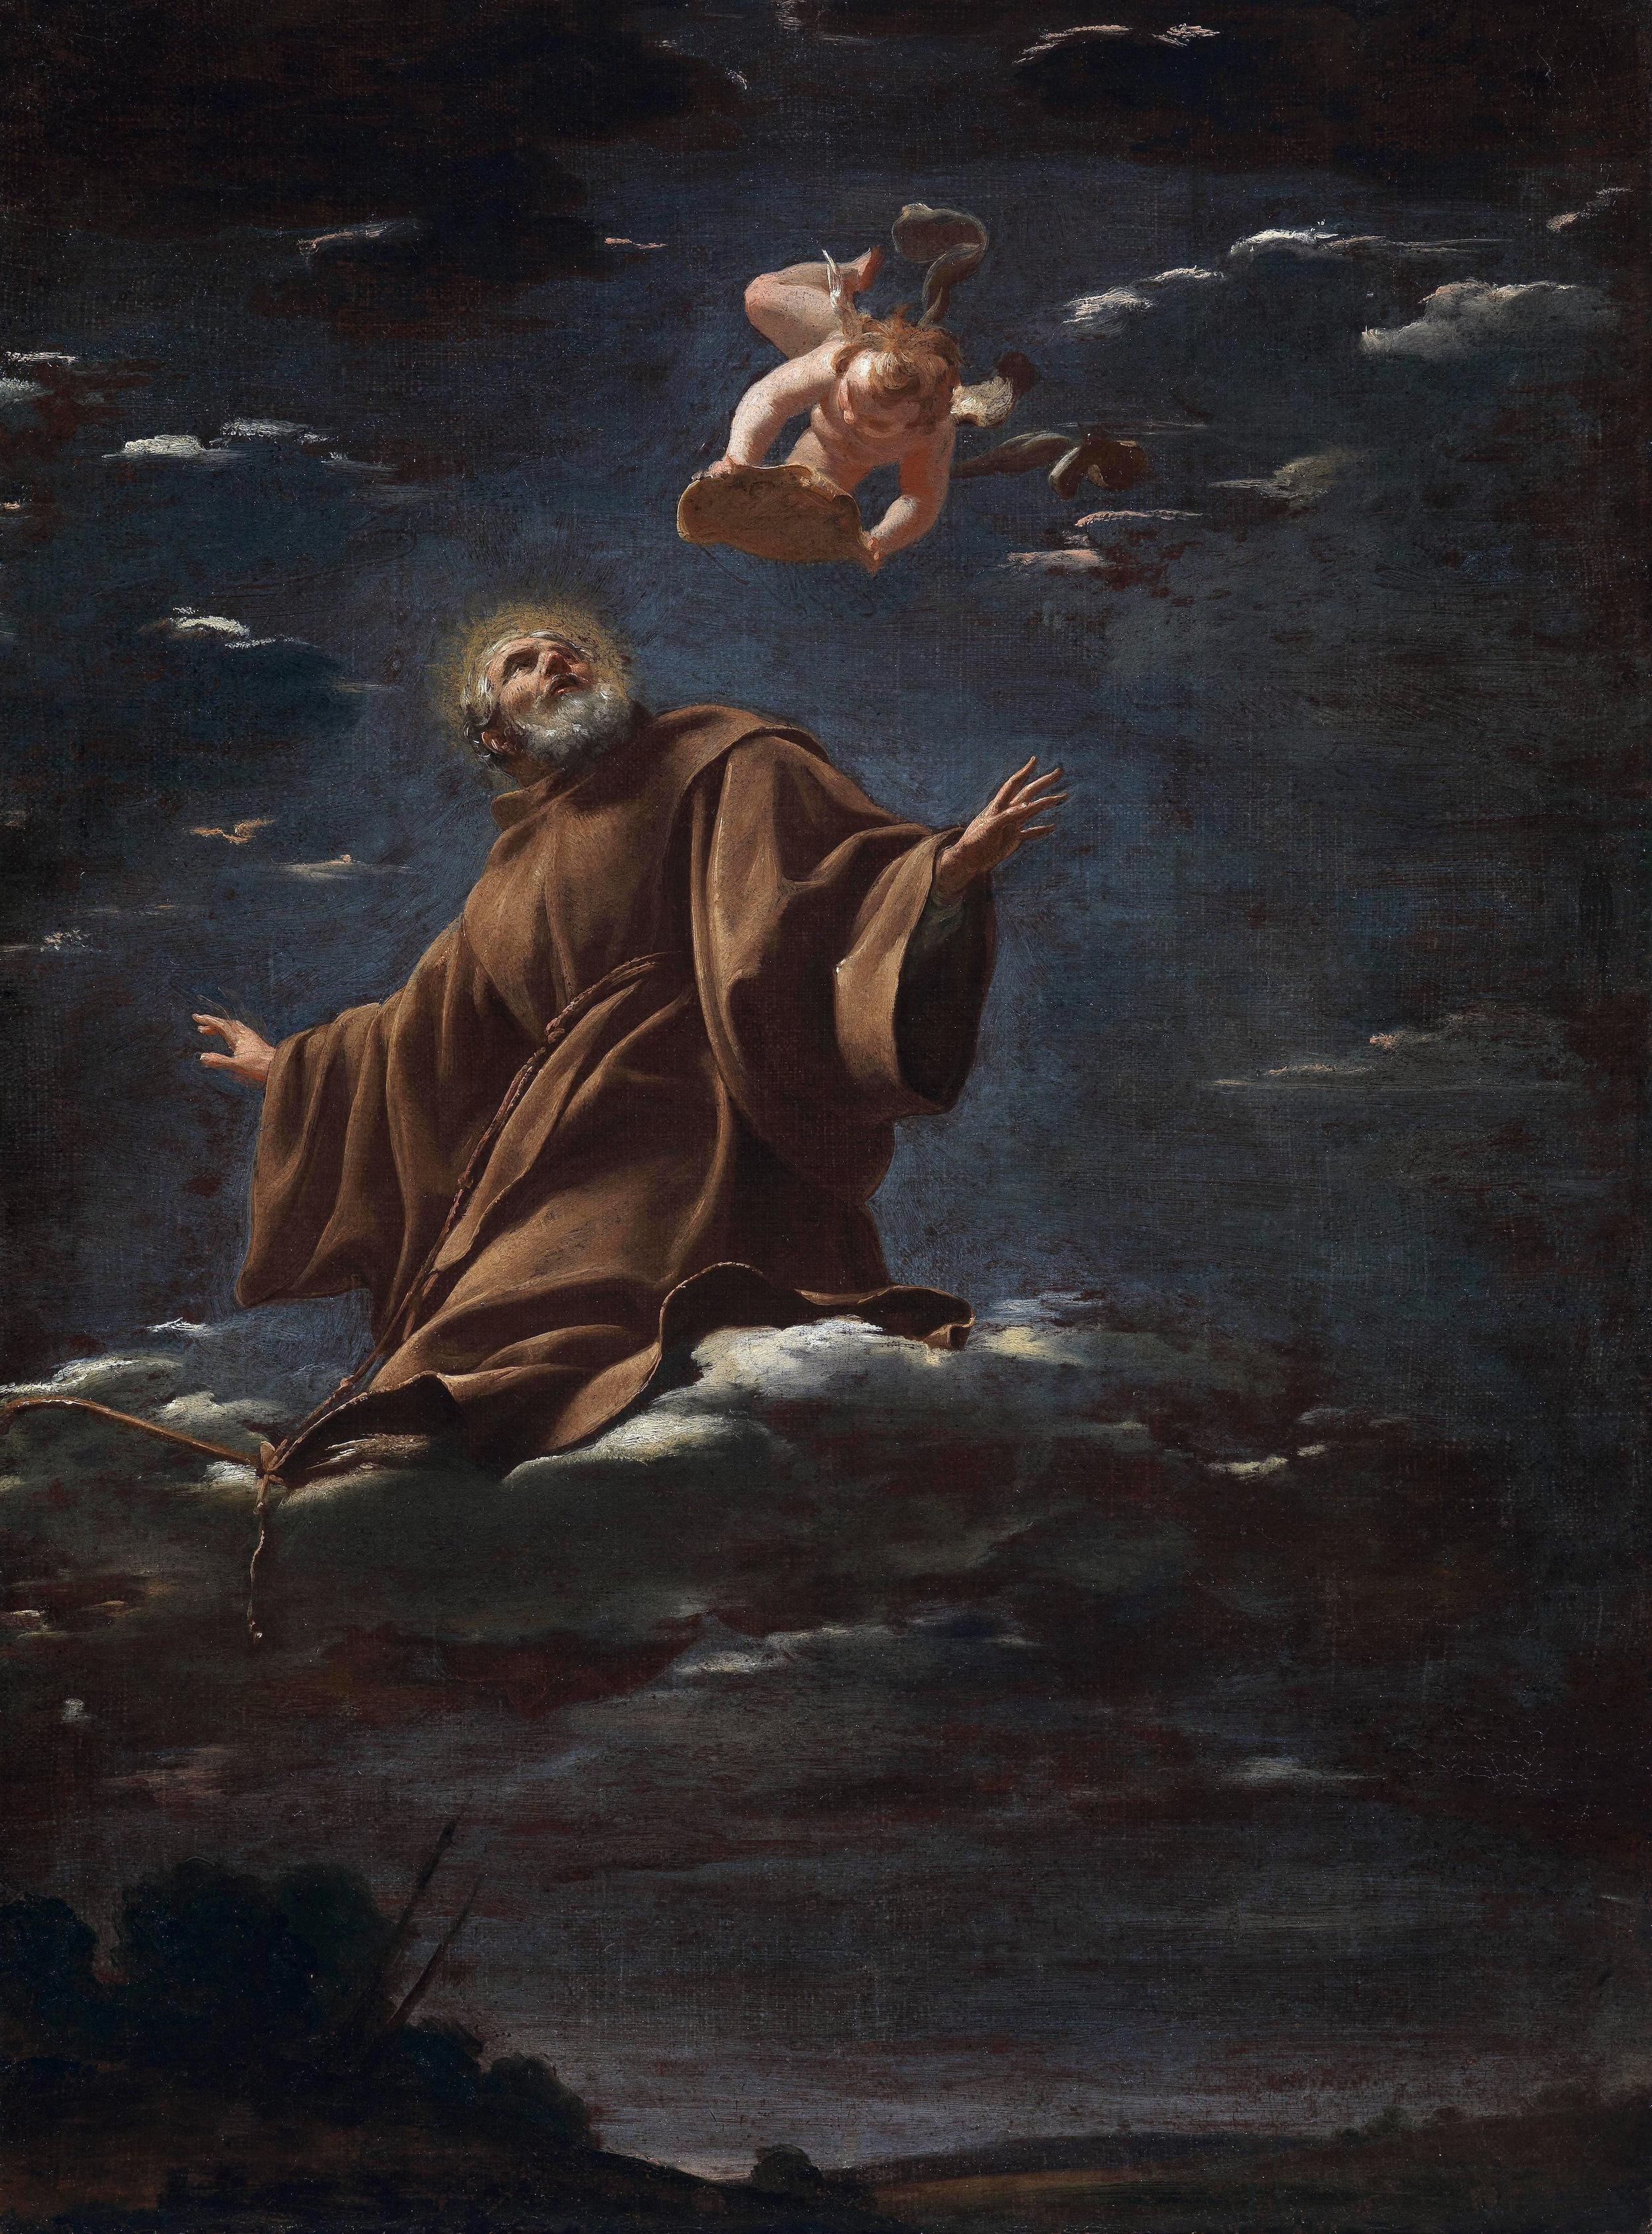 SIMON VOUET  Paris, 1590 - 1649         Apotheosis of Saint Francis of Paola   Circa 1625-1626        Oil on canvas  65 x 48 cm.        Sold to a private collection, Europe